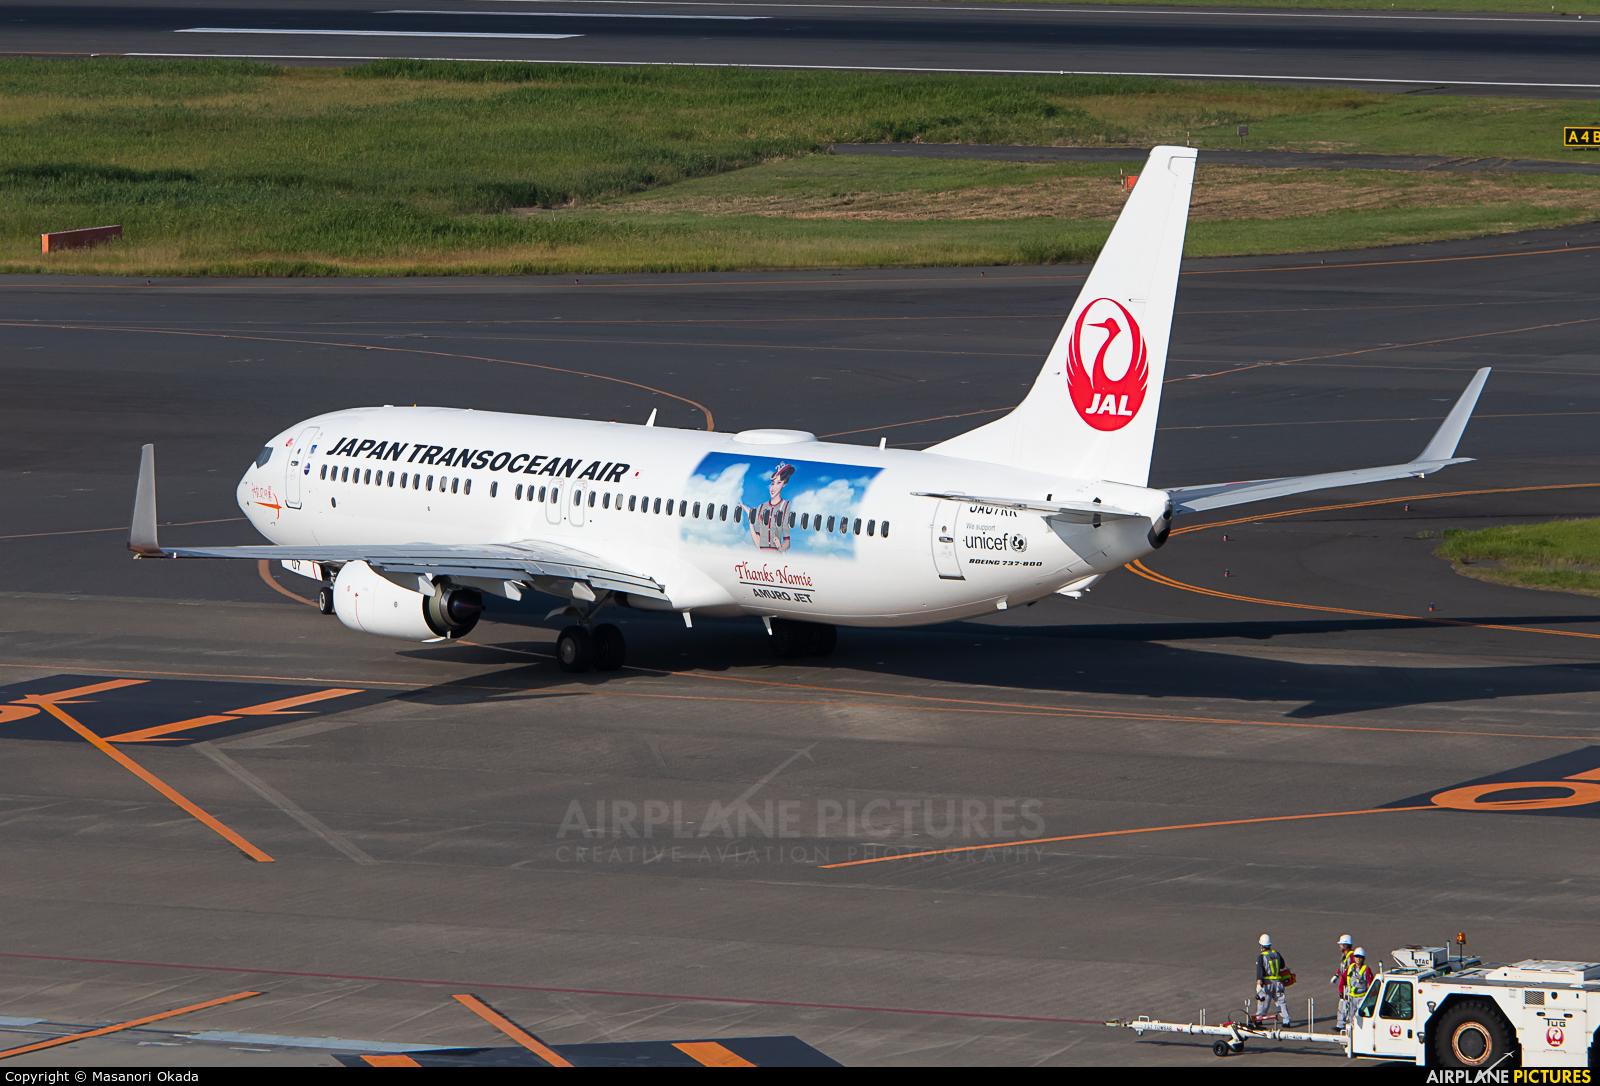 JAL - Japan Transocean Air JA07RK aircraft at Tokyo - Haneda Intl